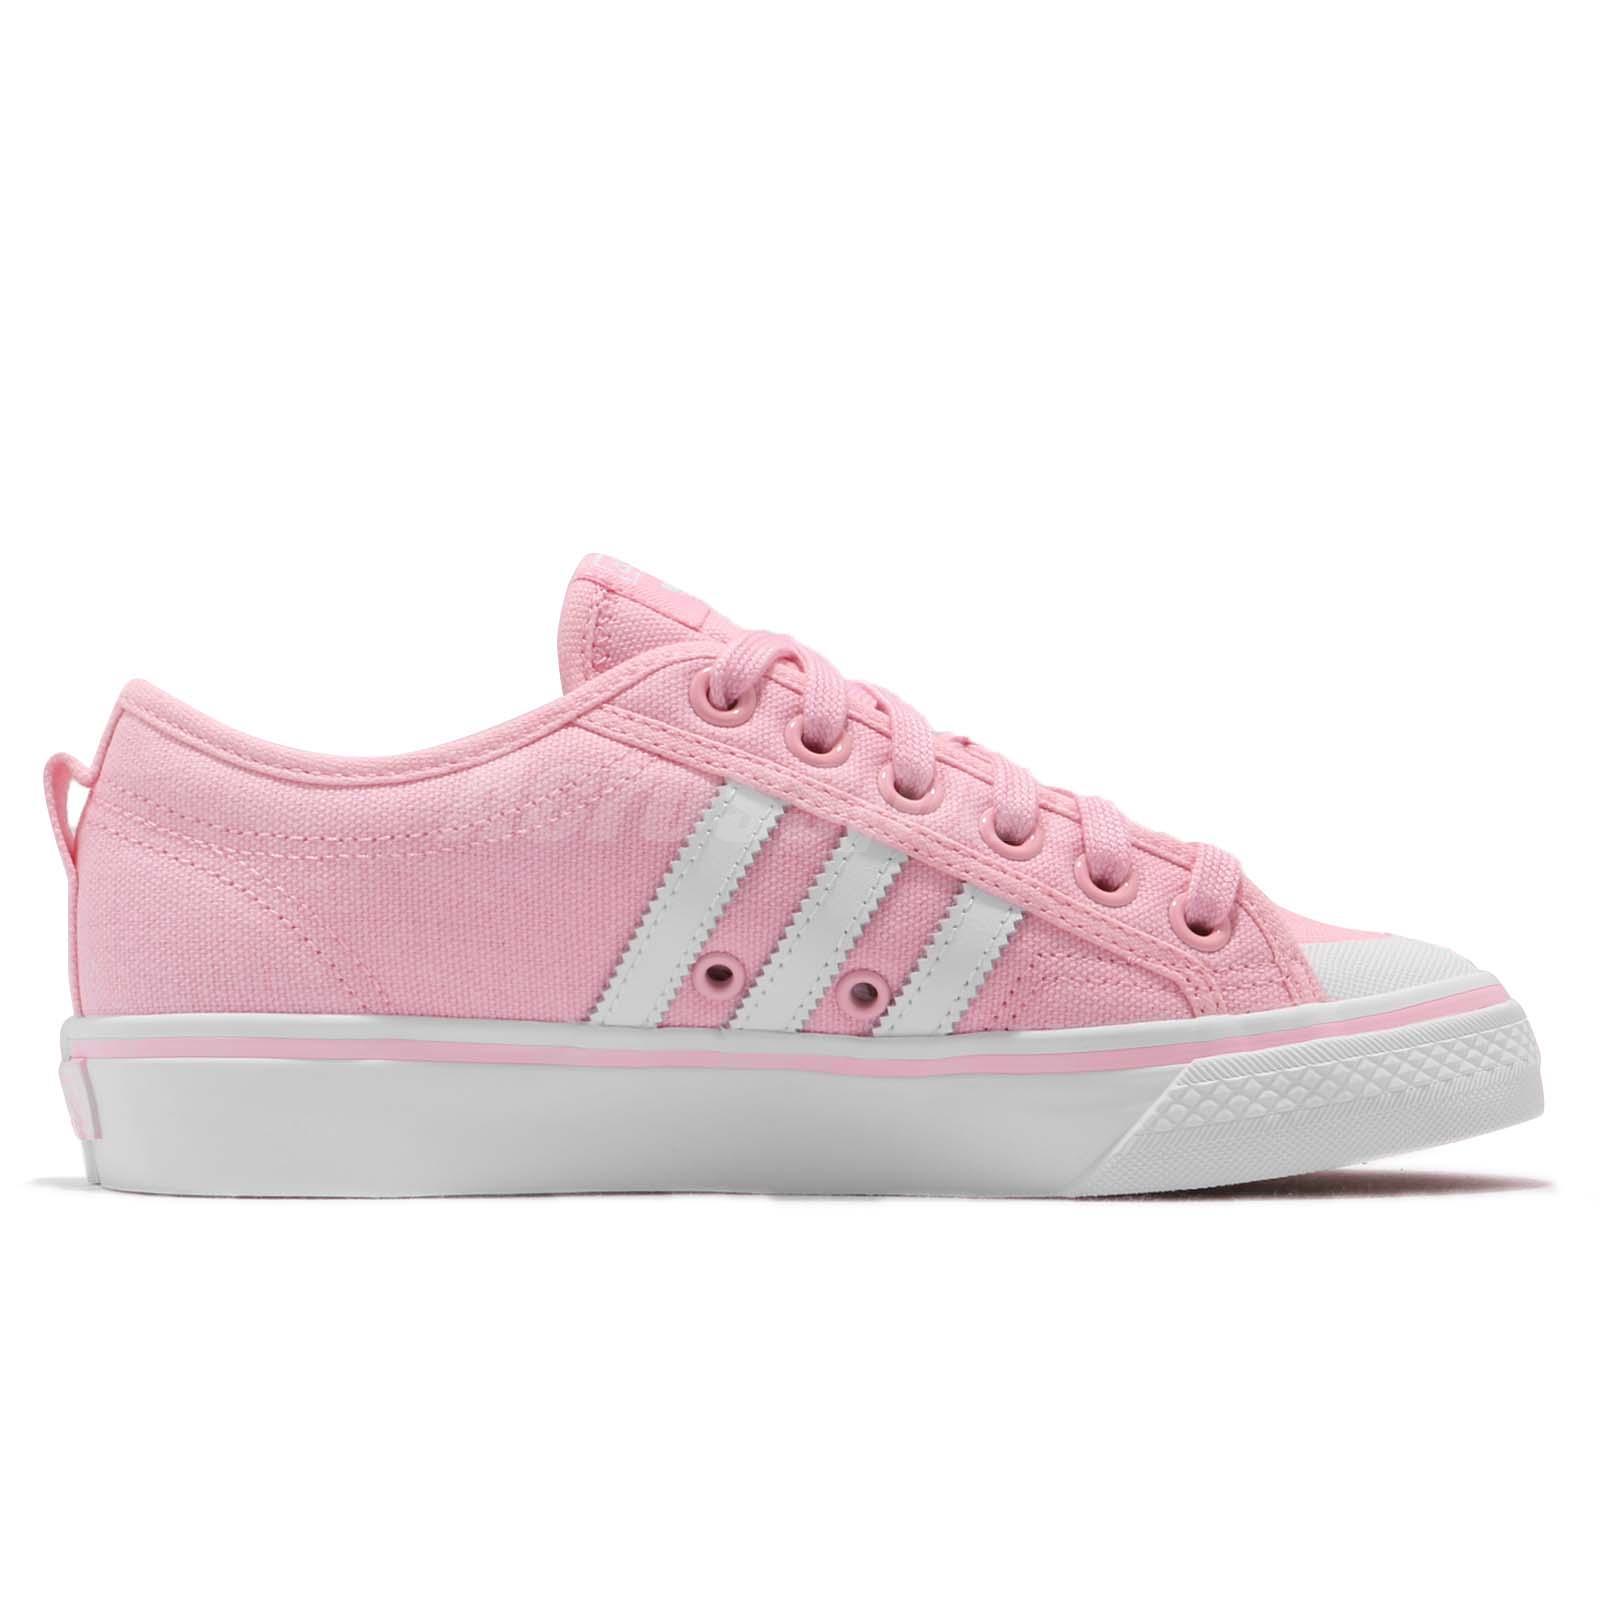 d956e9c84 adidas Originals Nizza W Wonder Pink Footwear White Women Casual ...